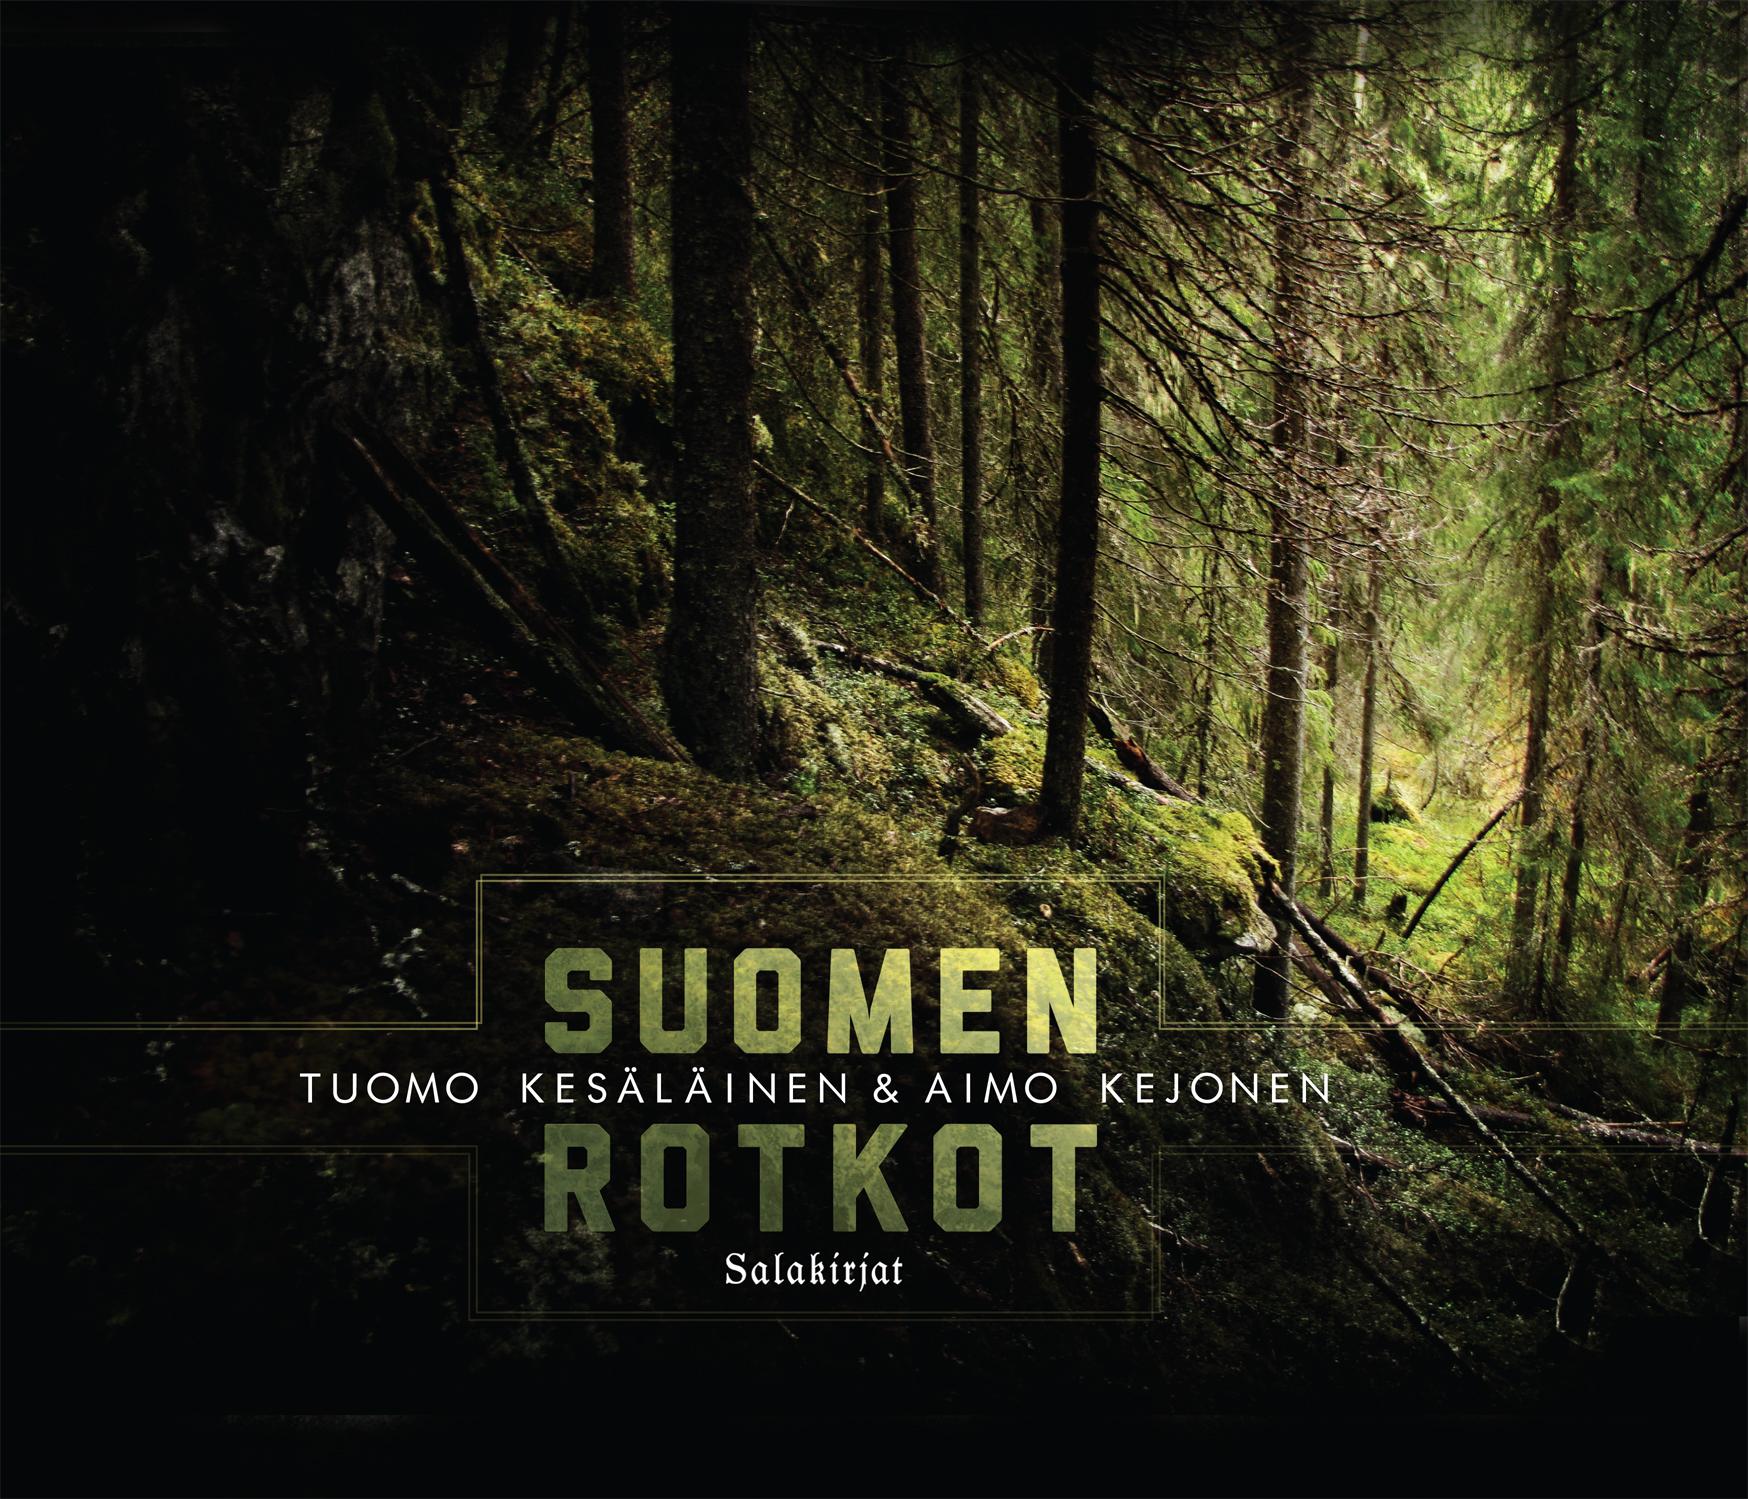 Suomen rotkot (Salakirjat 2014)